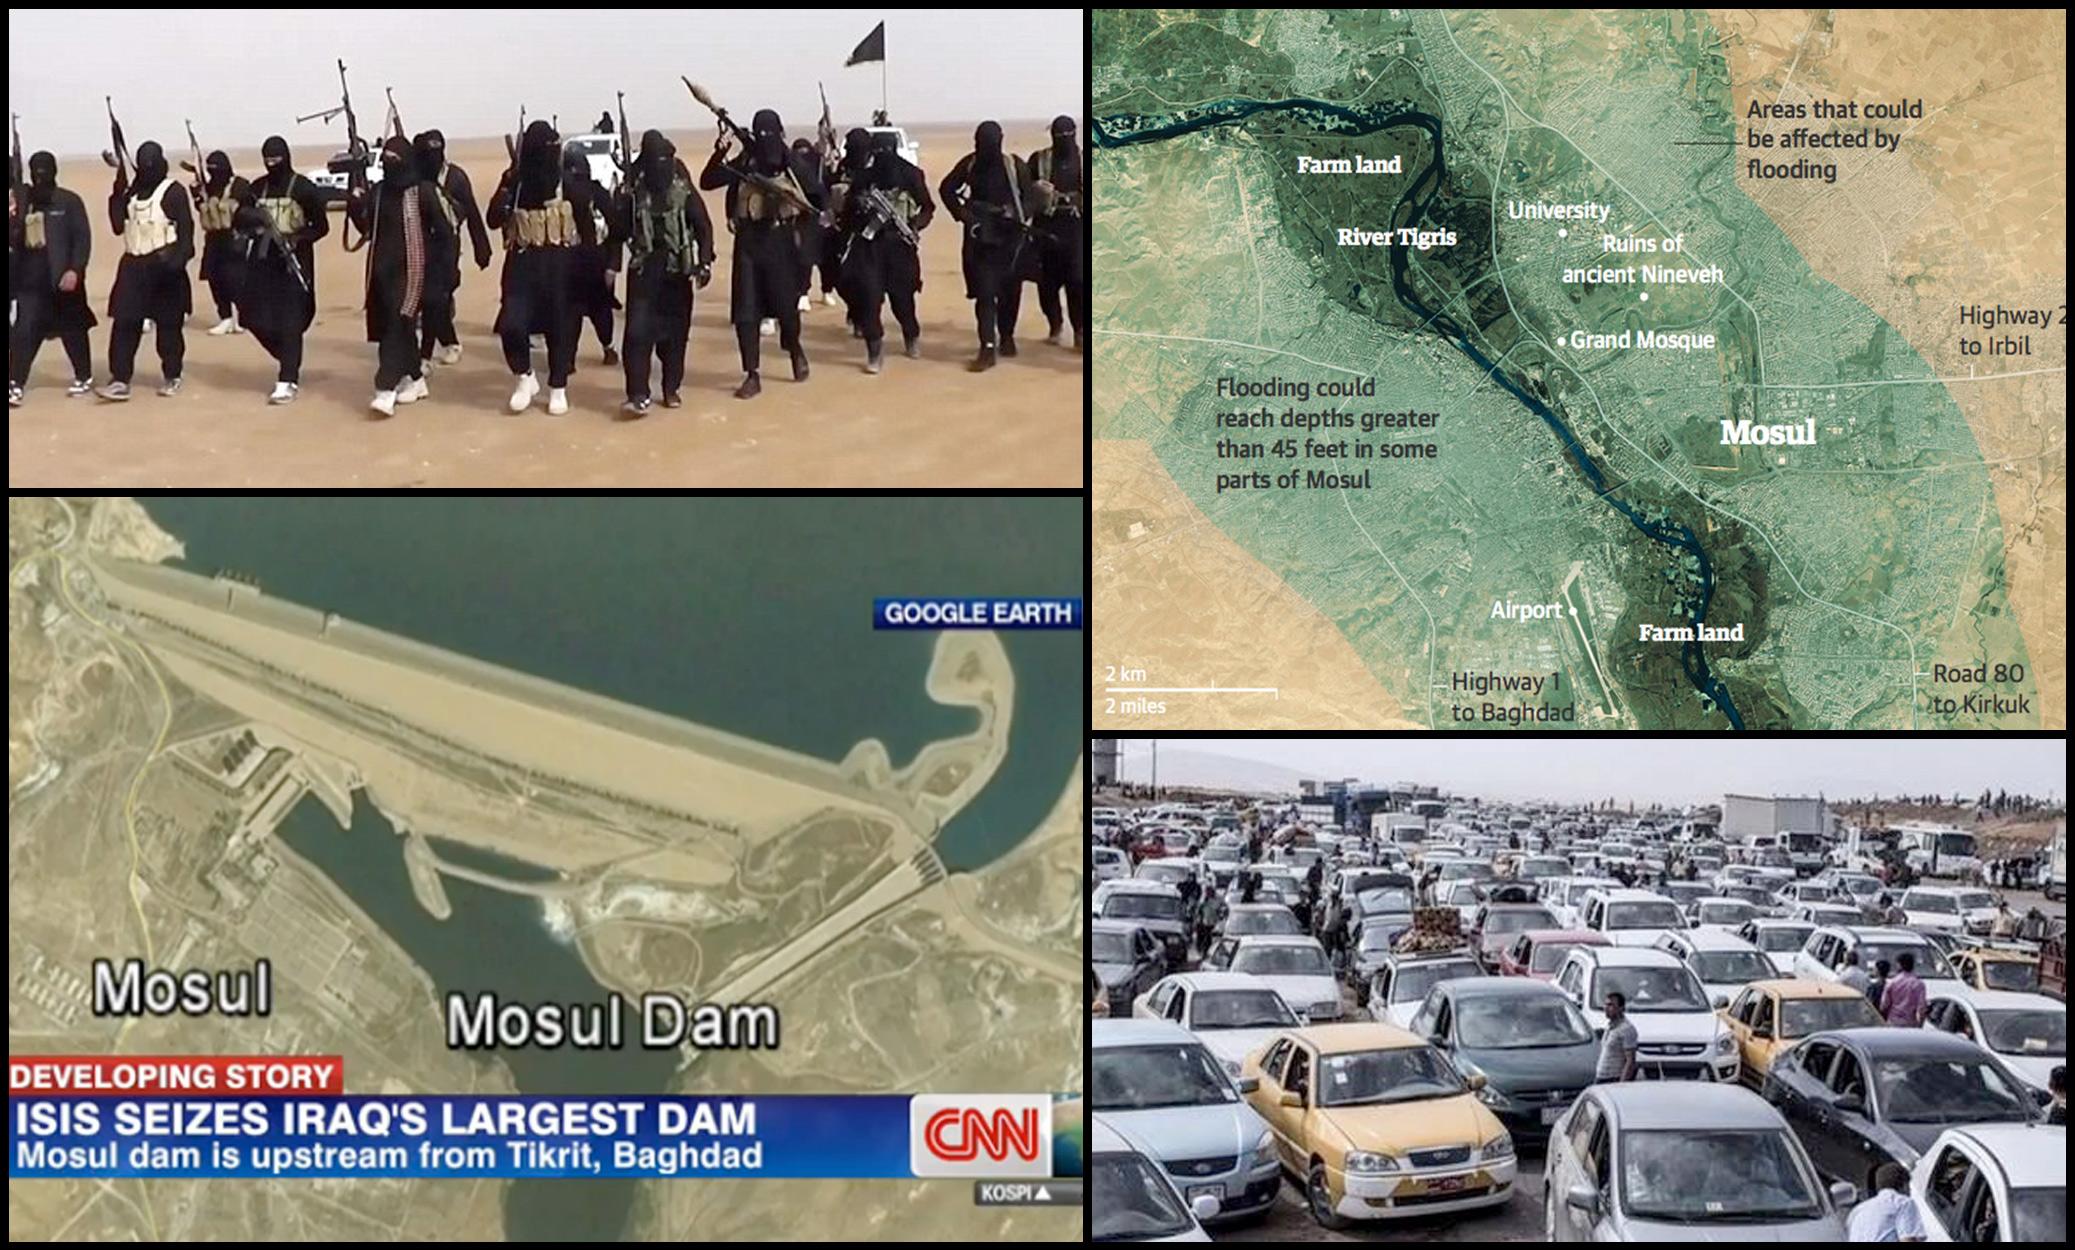 flood, mosul, iraq, evacuation, isil